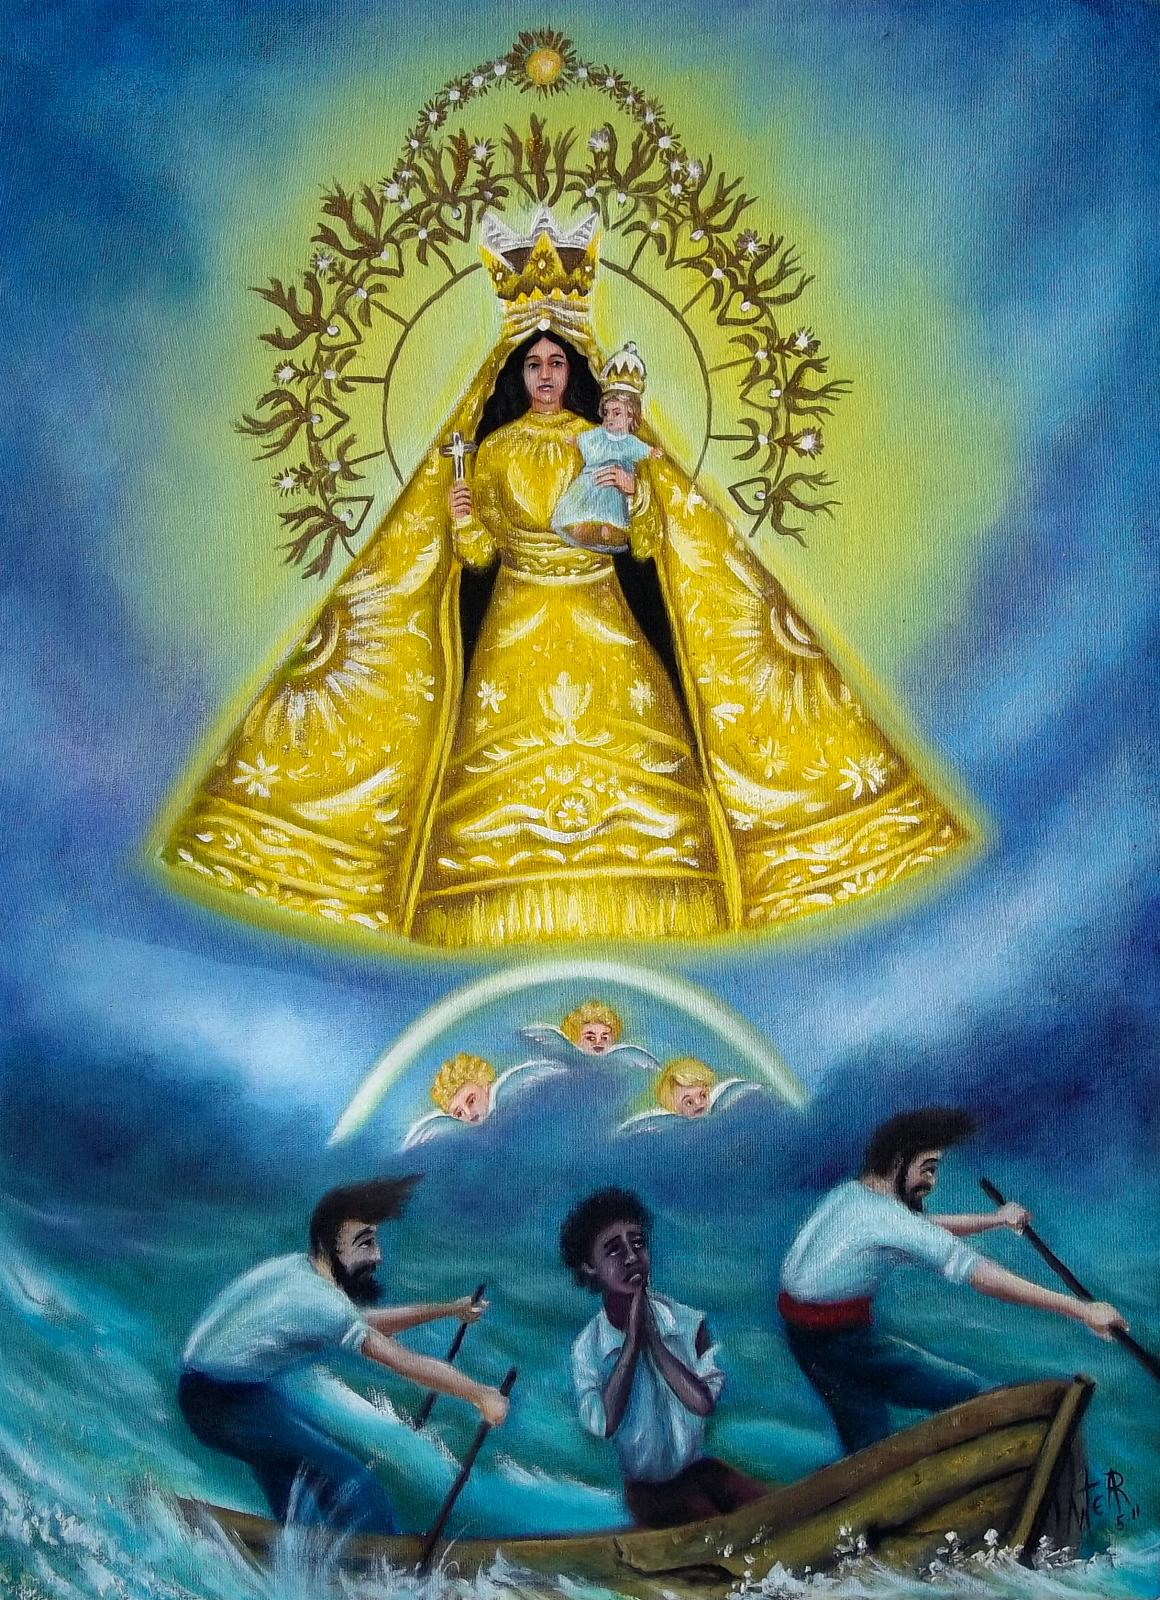 Virgen de La Caridad by Artemio Alvarez Ramirez